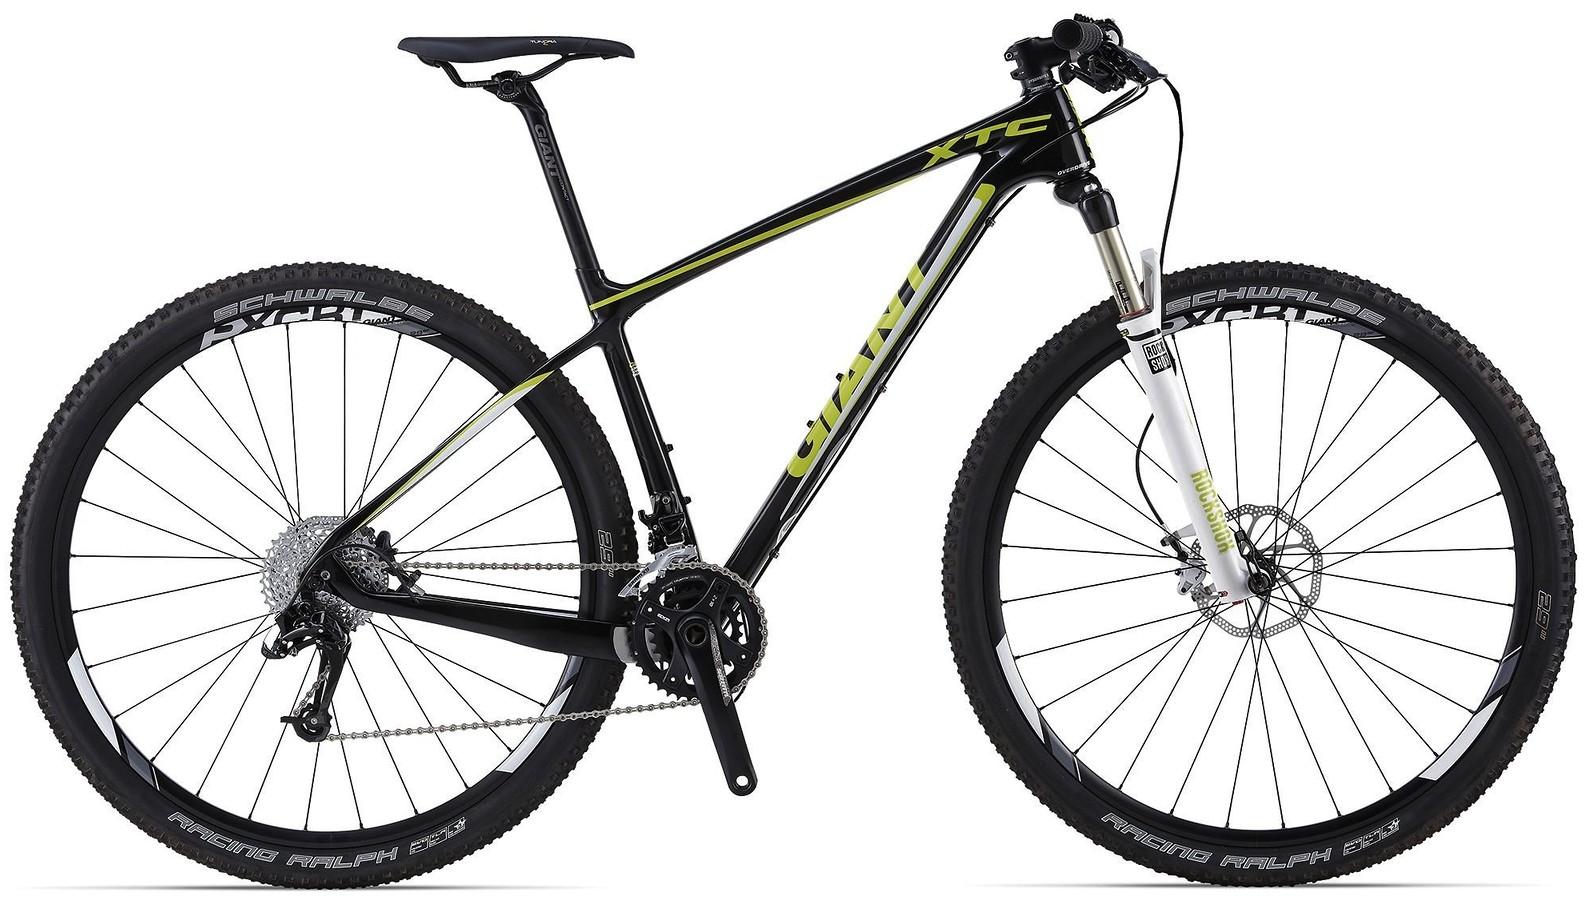 Bicicletta Cross Country - XTC Advanced SL 27.5 1- GIANT ...